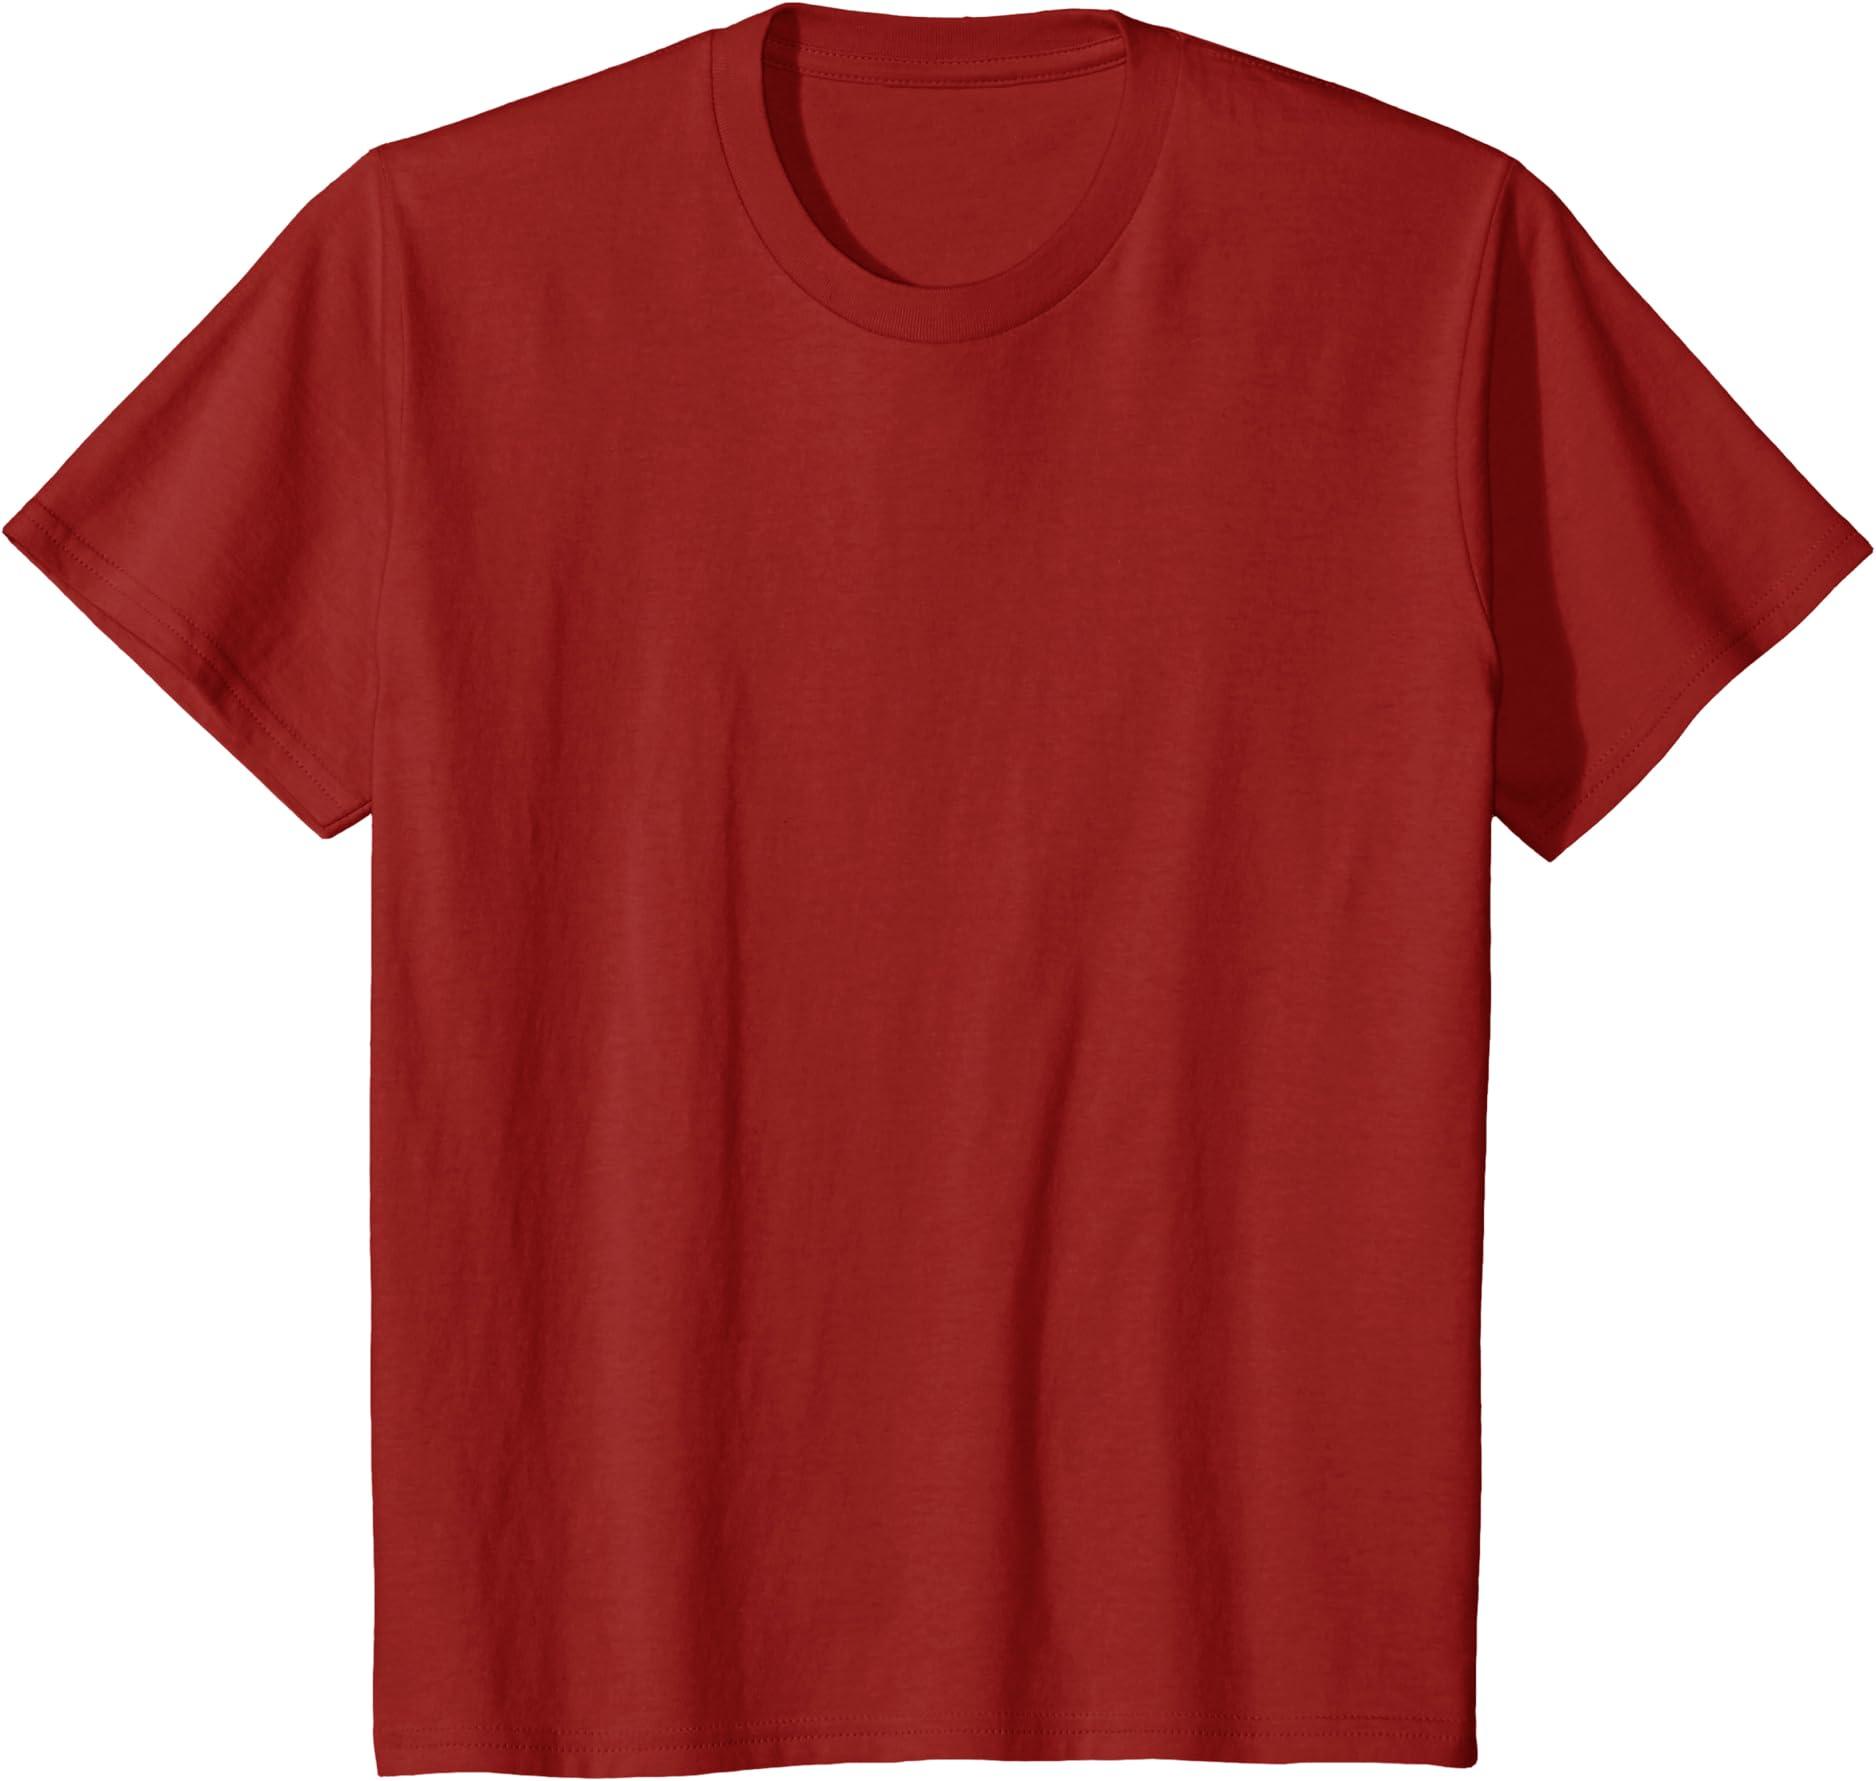 You Had Me At Jon Snow Womens T-Shirt